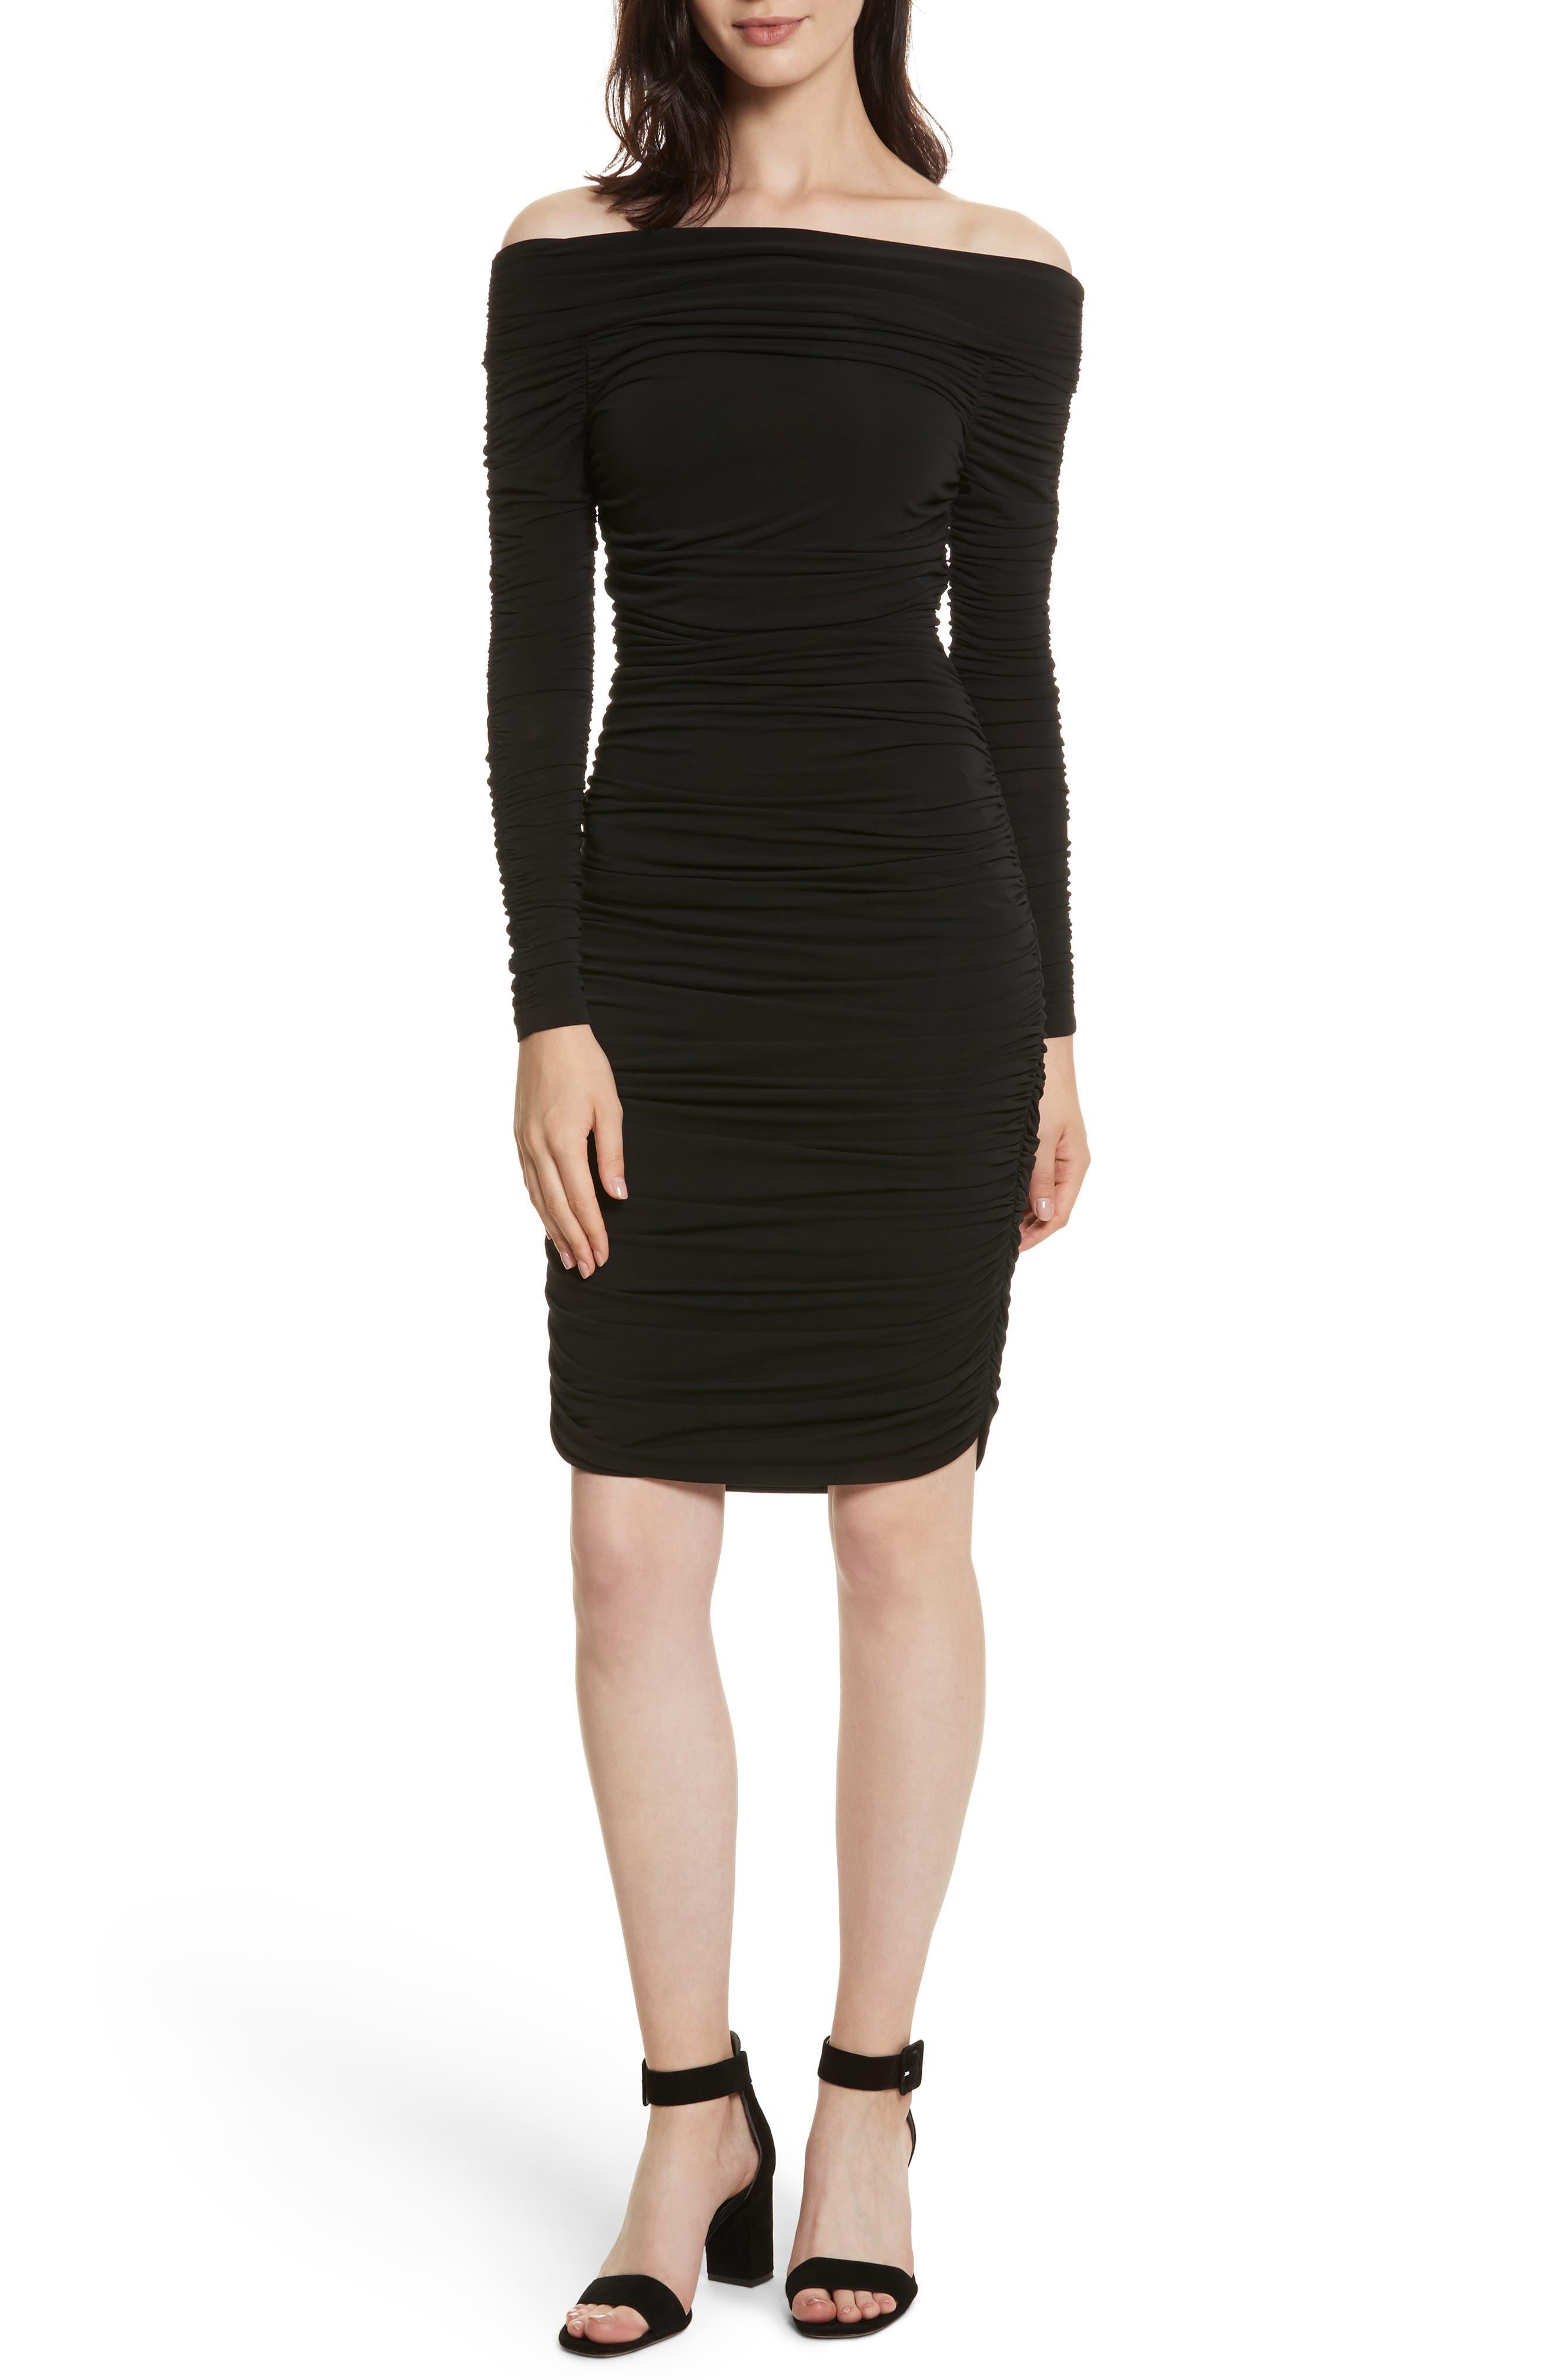 Blaise Off the Shoulder Ruched Dress,                             Main thumbnail 1, color,                             Black